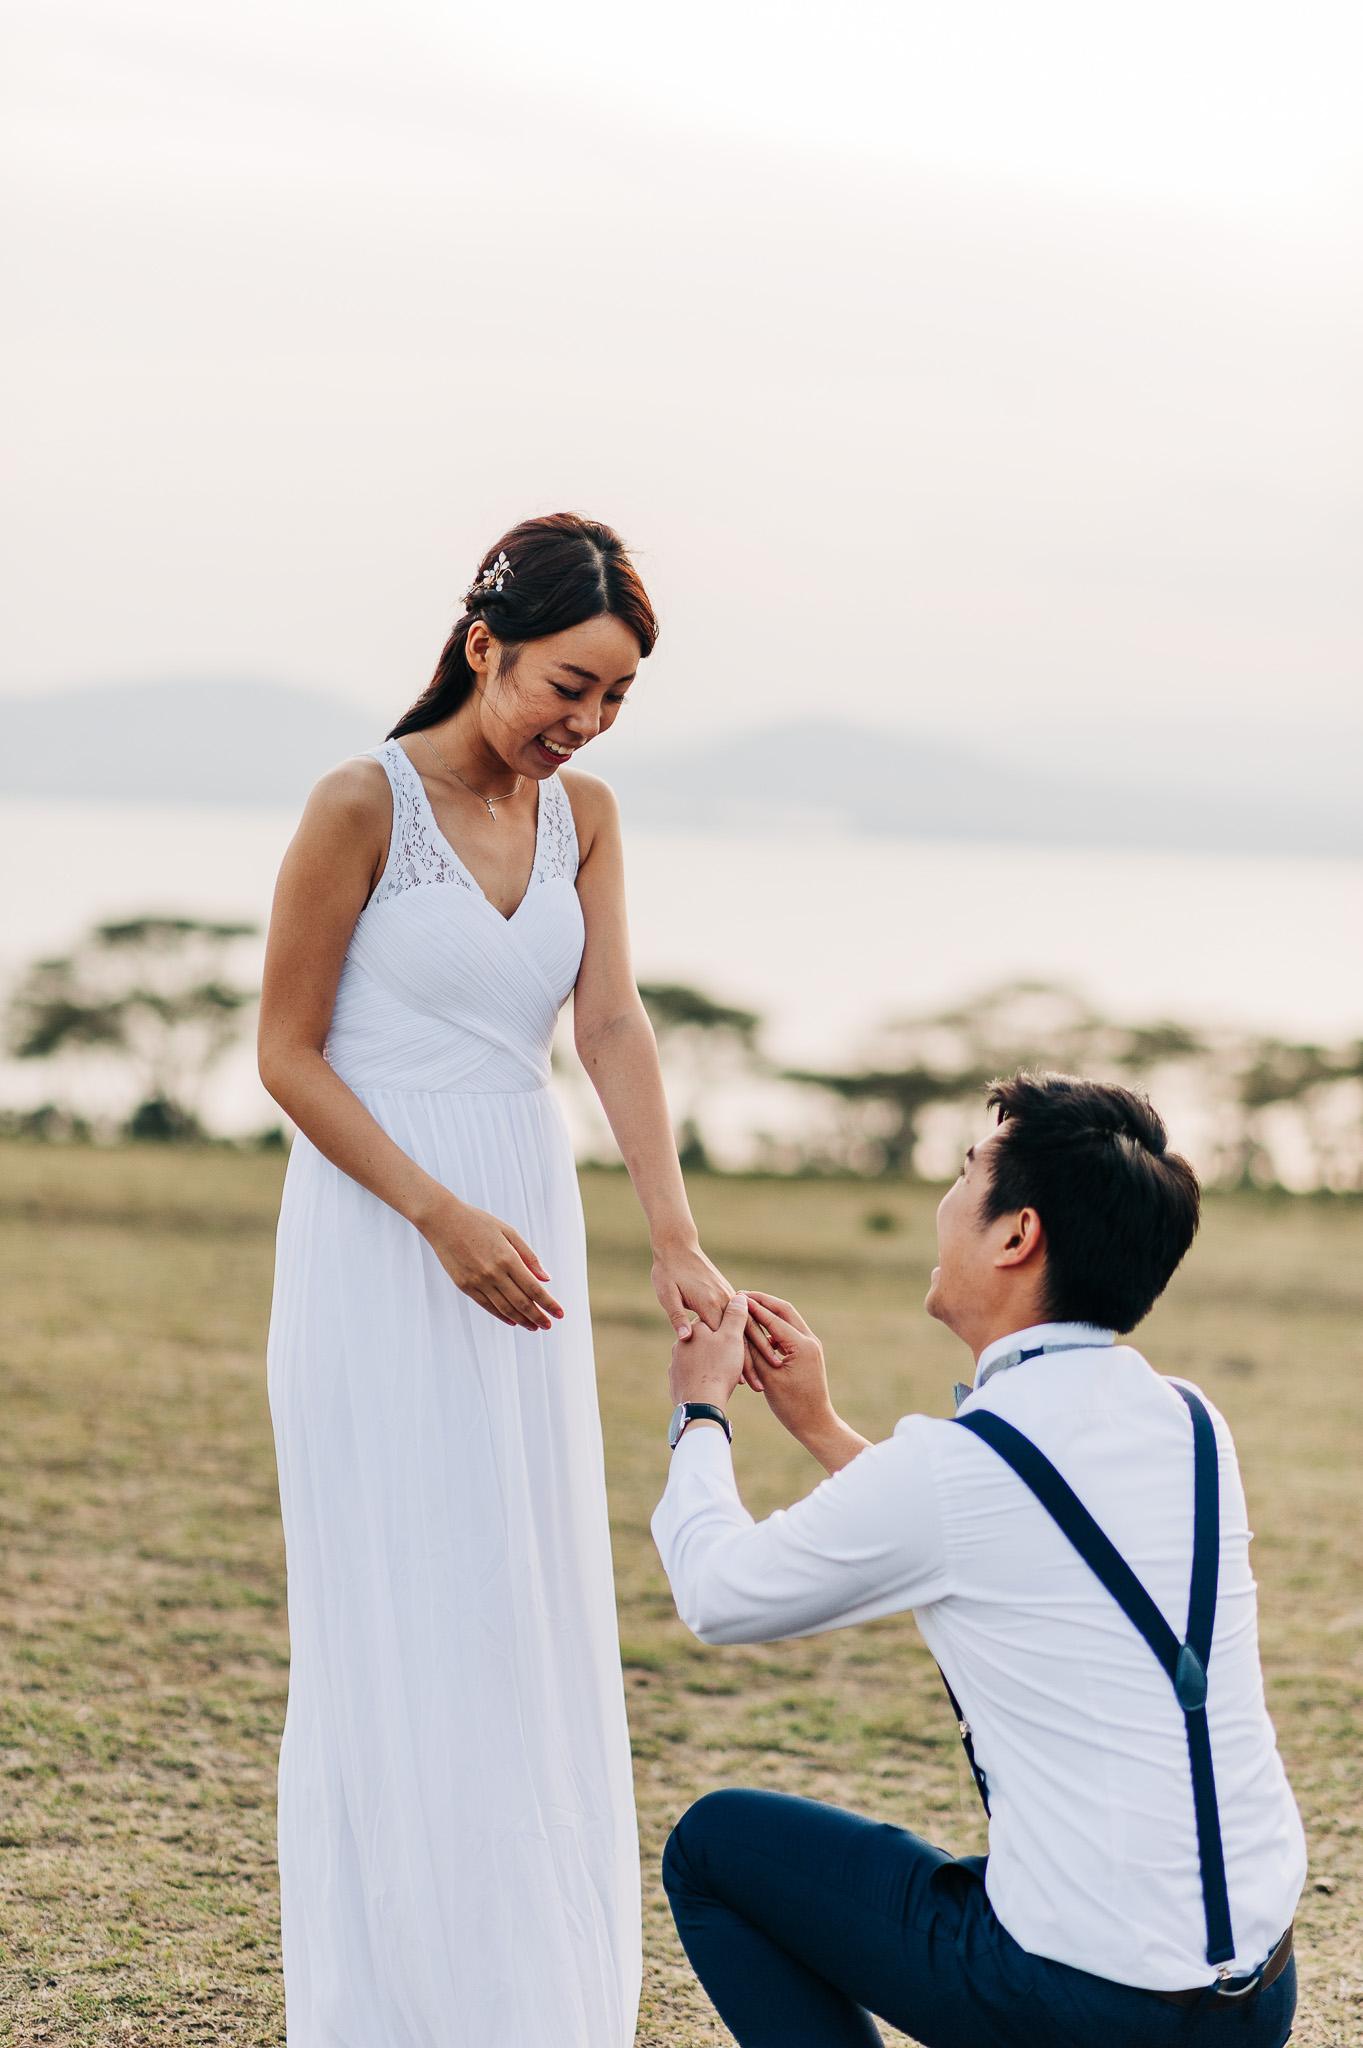 Anna-Hari-Photography-Safari-Elopement-Kenya-Wedding-Photographer-Kenya-88.jpg